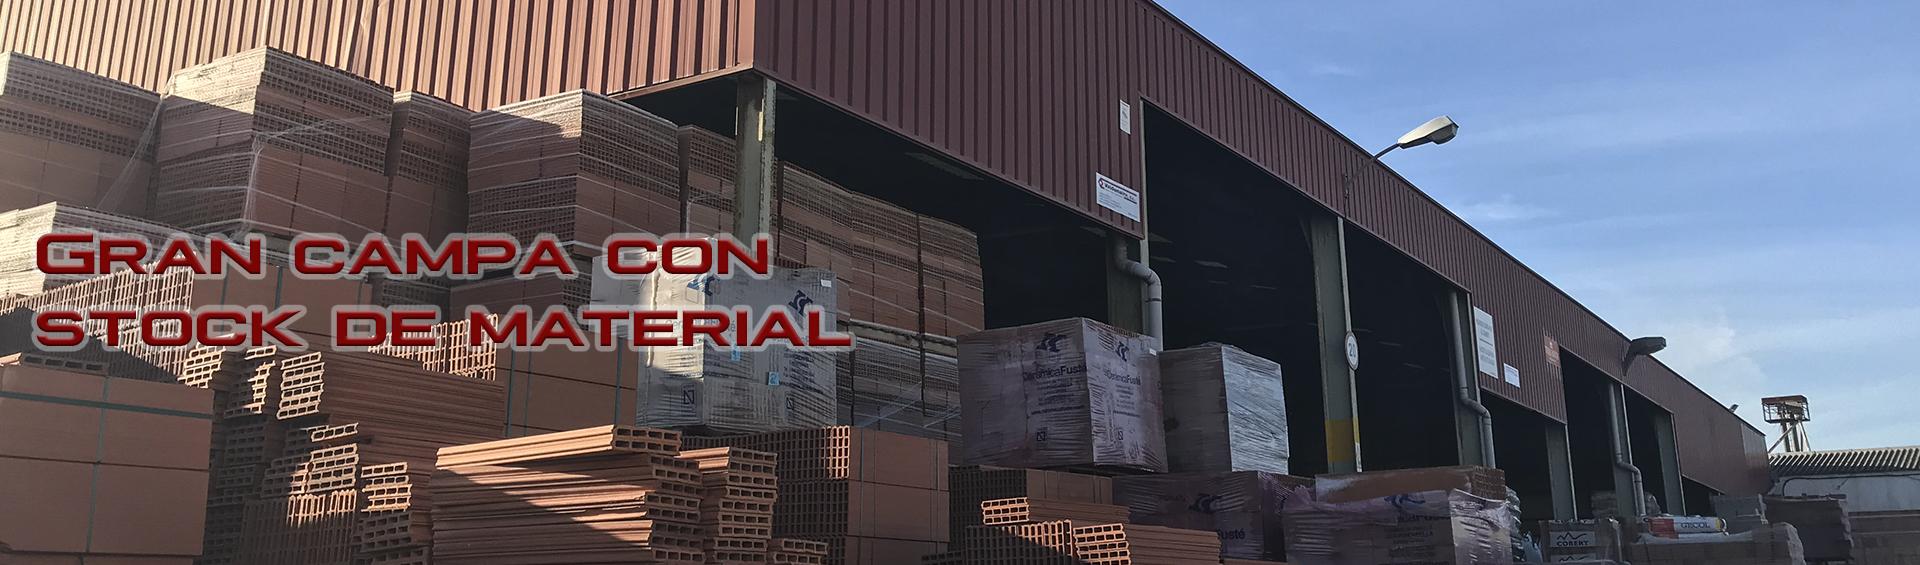 Campa material con gran stock en Suministros Valdonaire